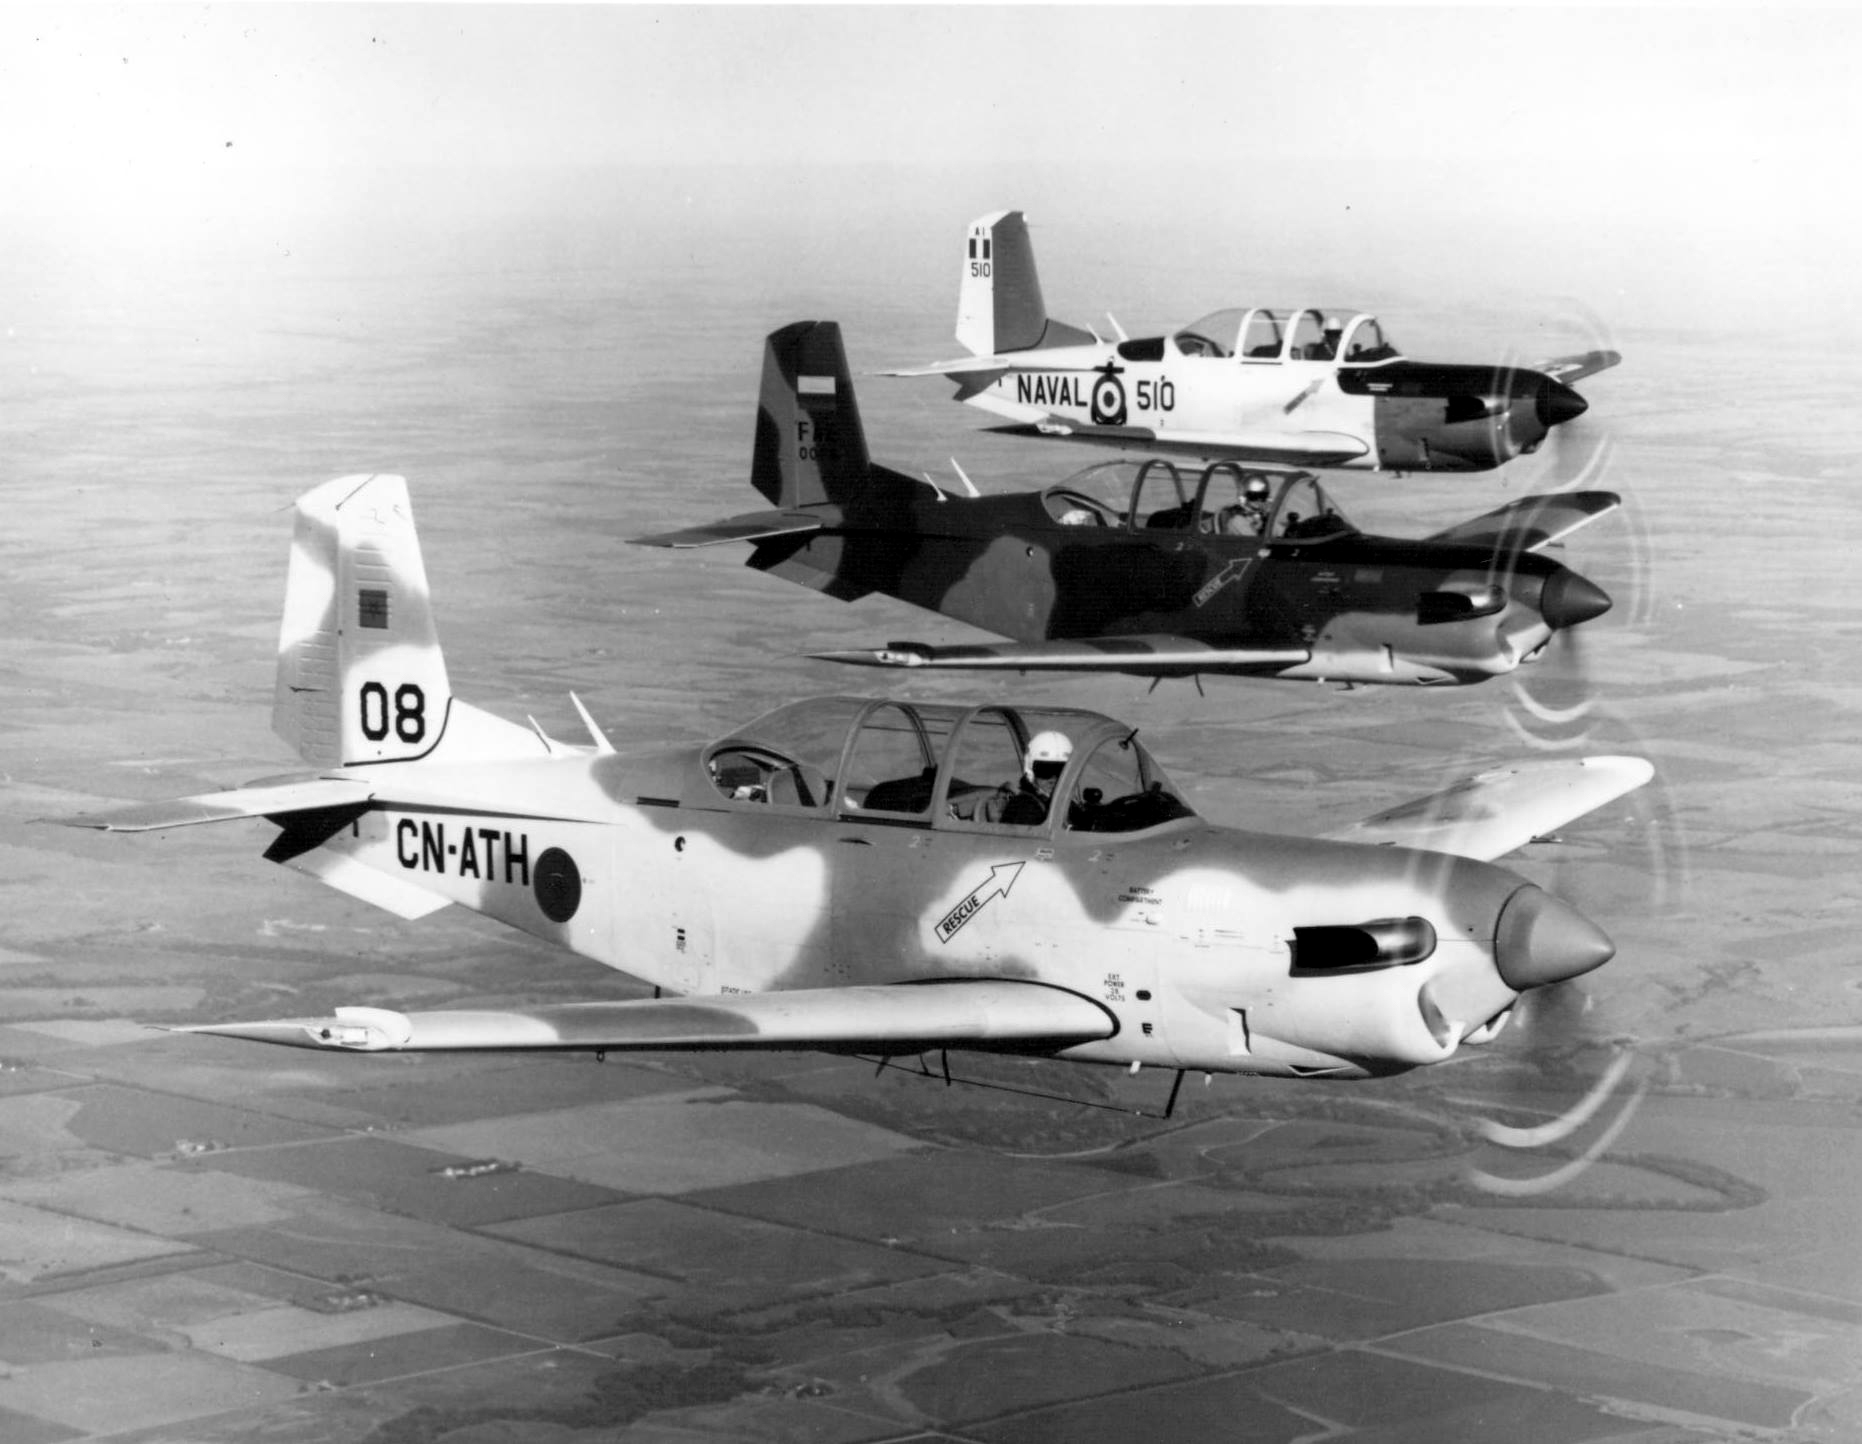 FRA: Photos anciens avions des FRA - Page 12 48178880676_40980c4401_o